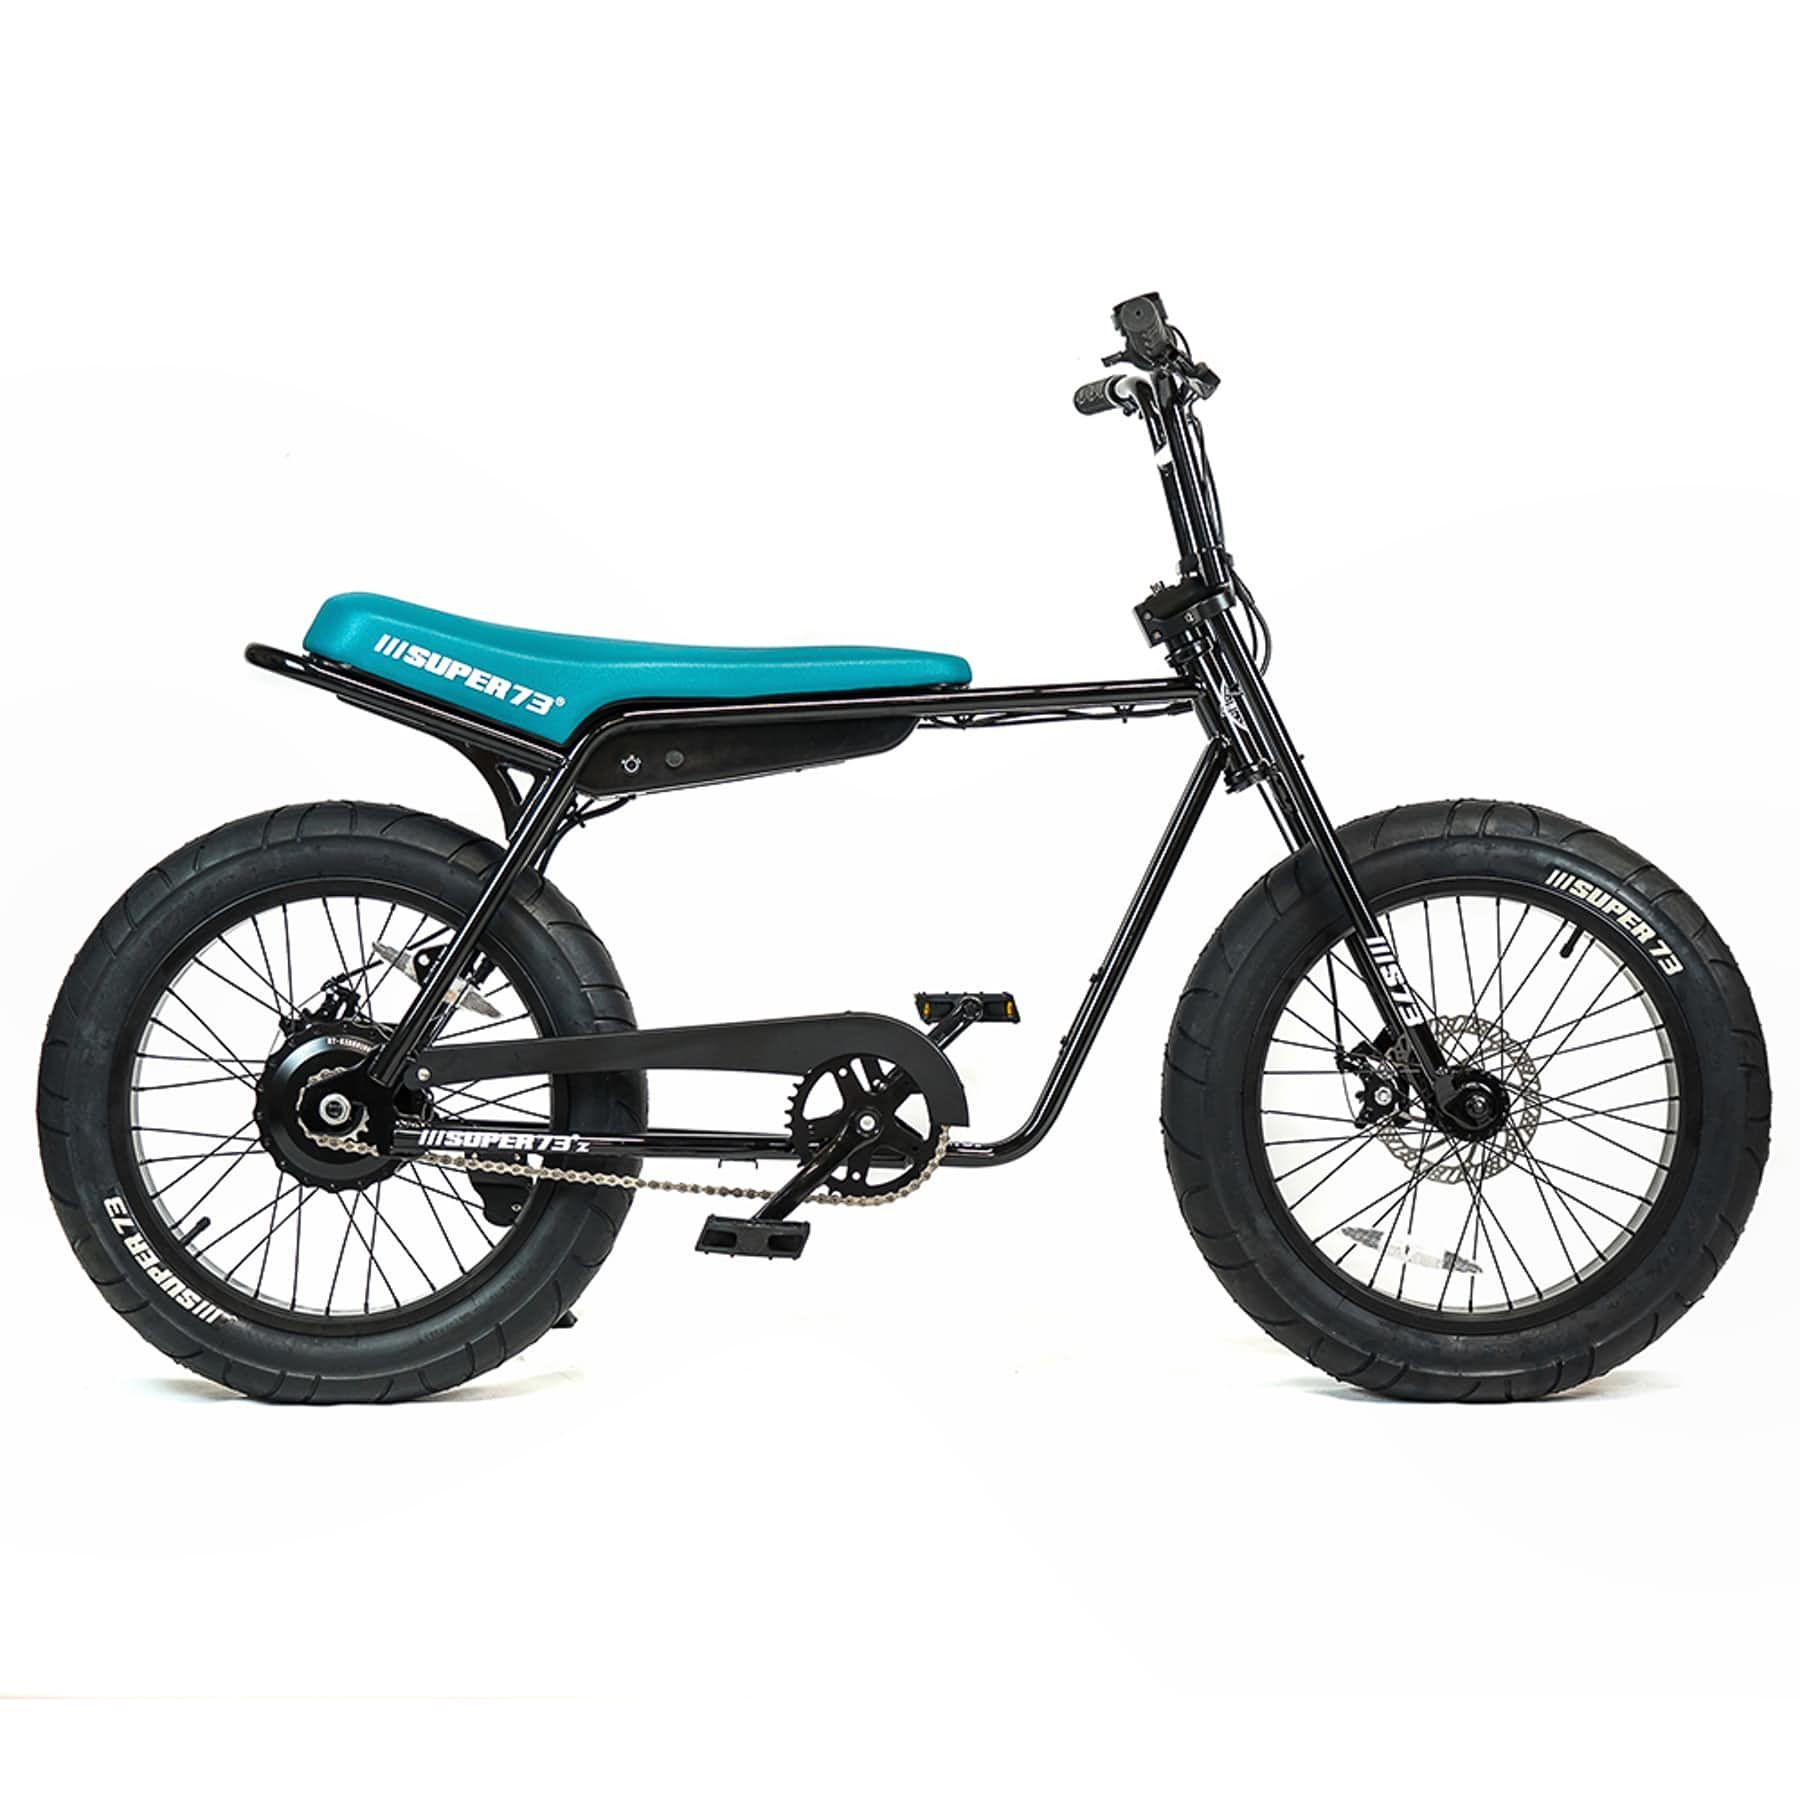 Super73 Z1 Lightweight E Bike Custom Bikes Electric Motorbike Electric Bike